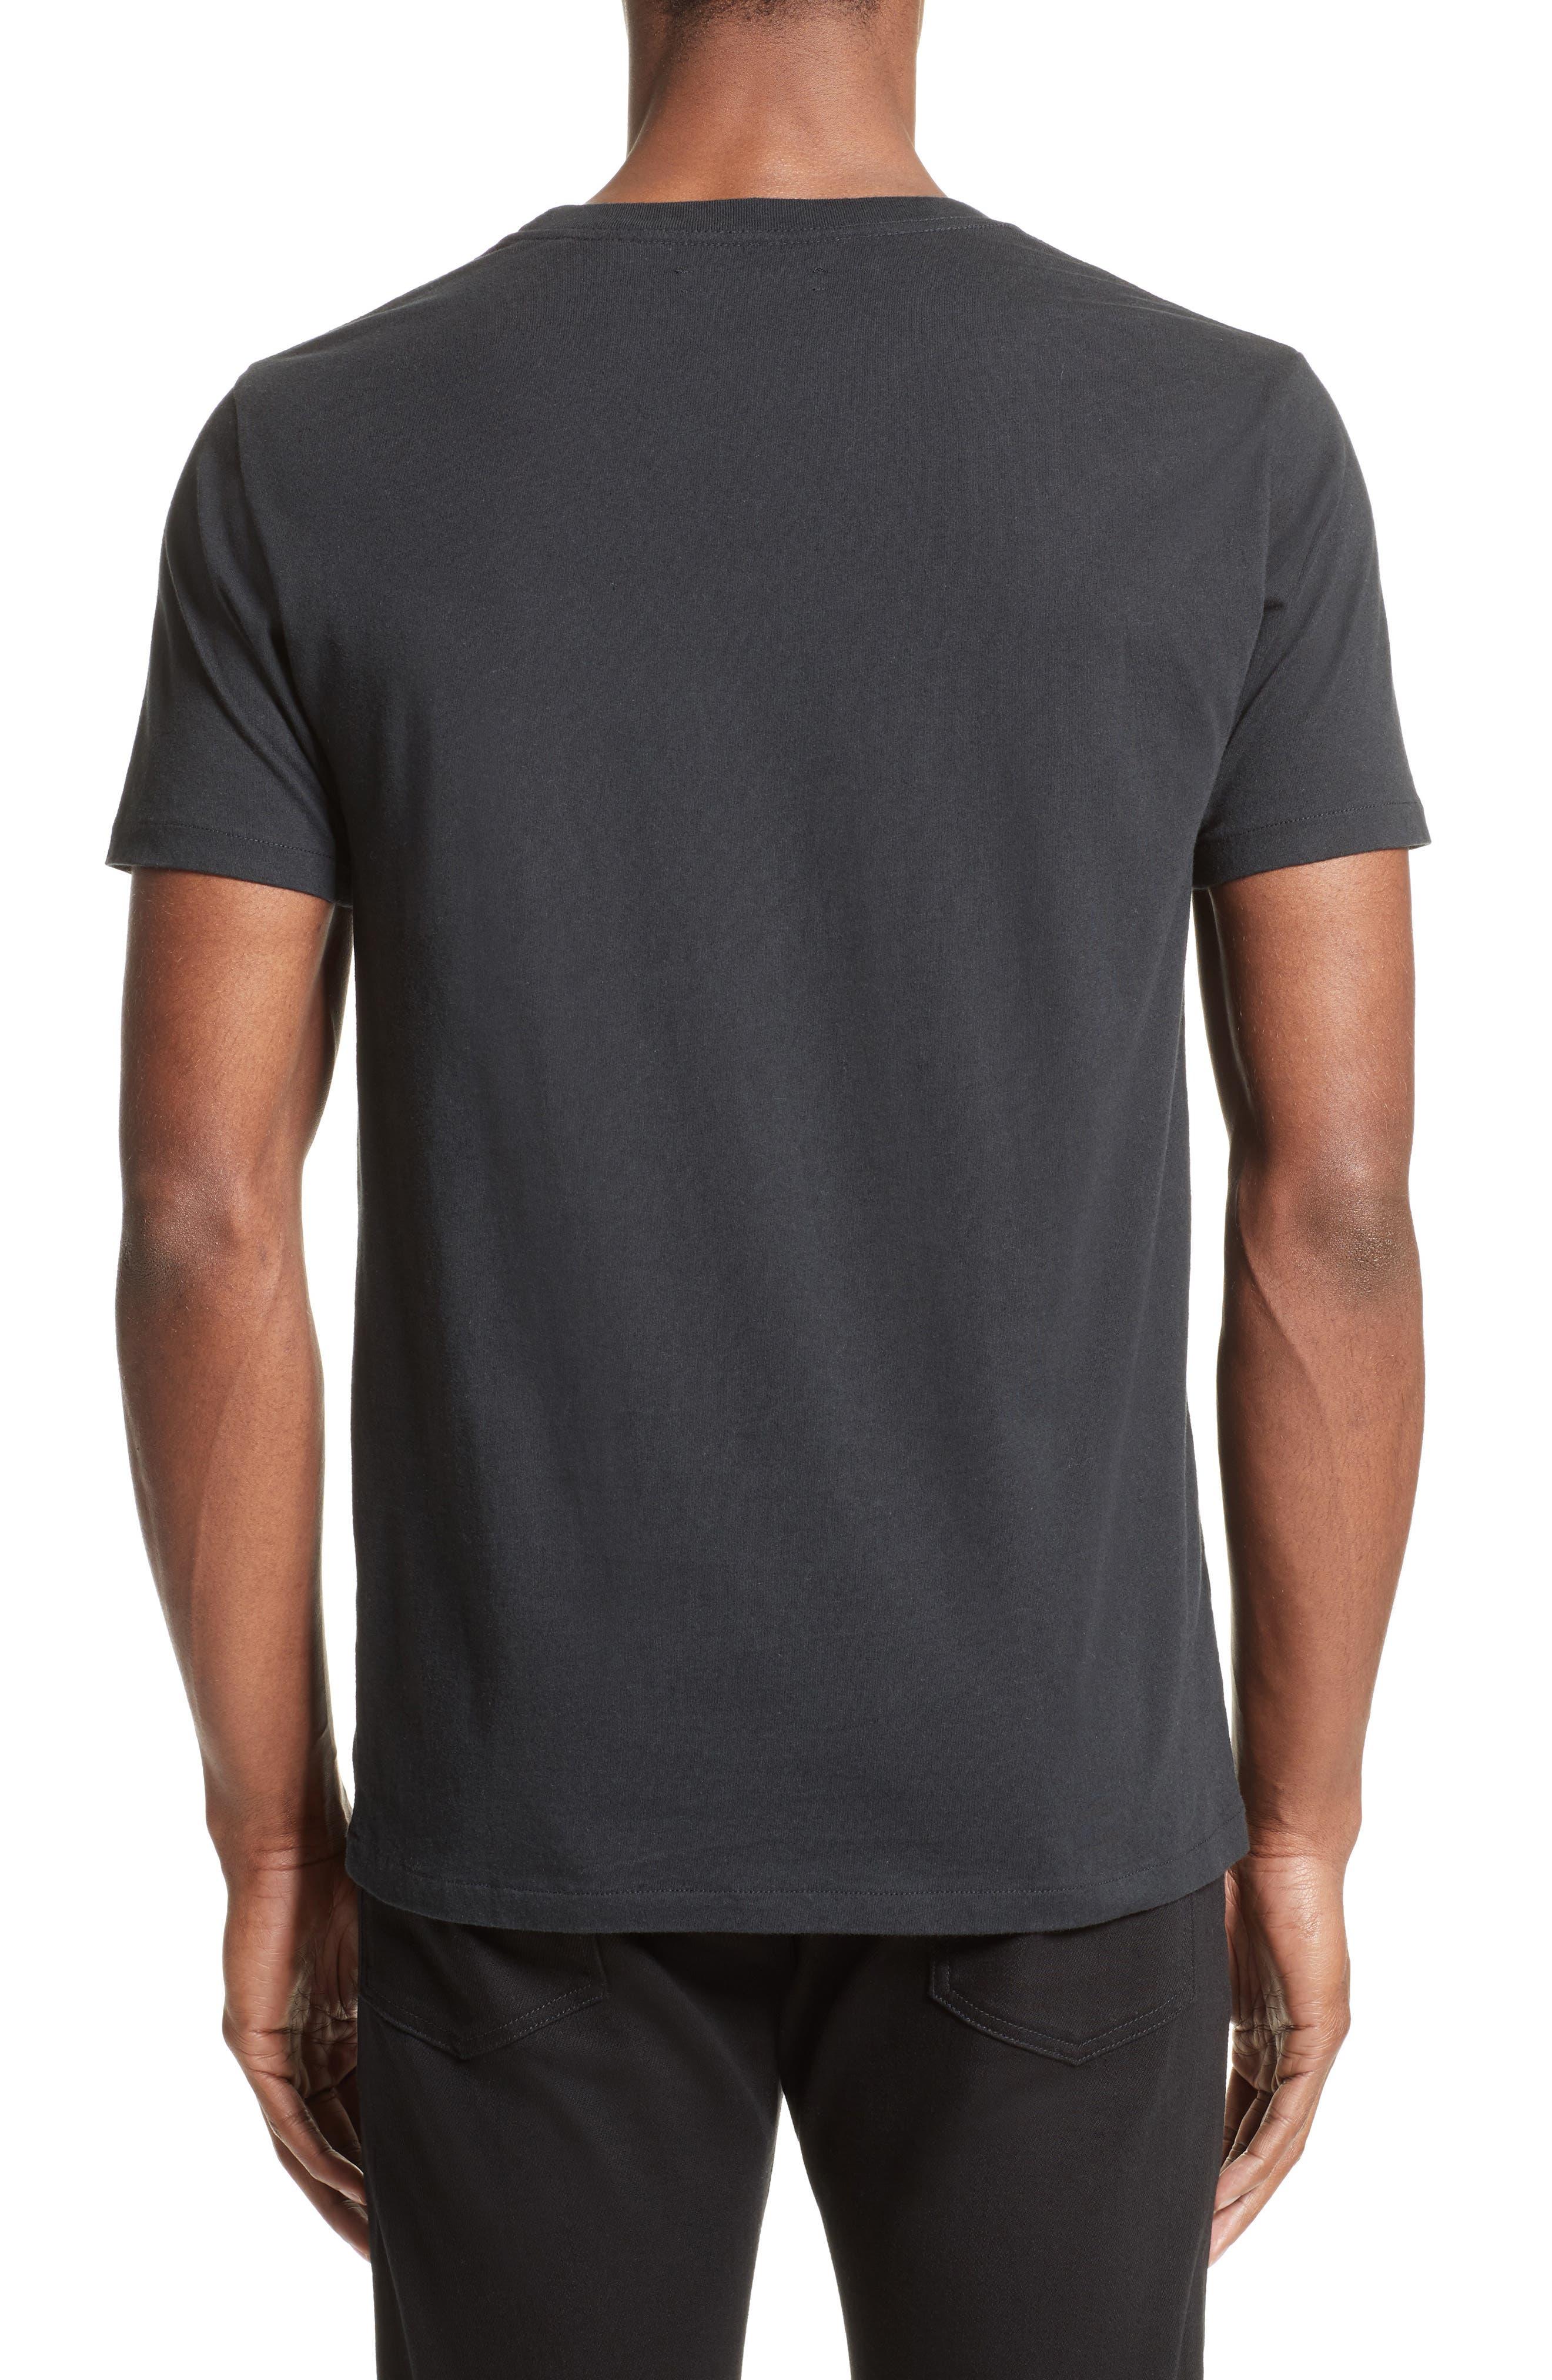 Alternate Image 2  - Levi's® Made & Crafted™ Pocket T-Shirt